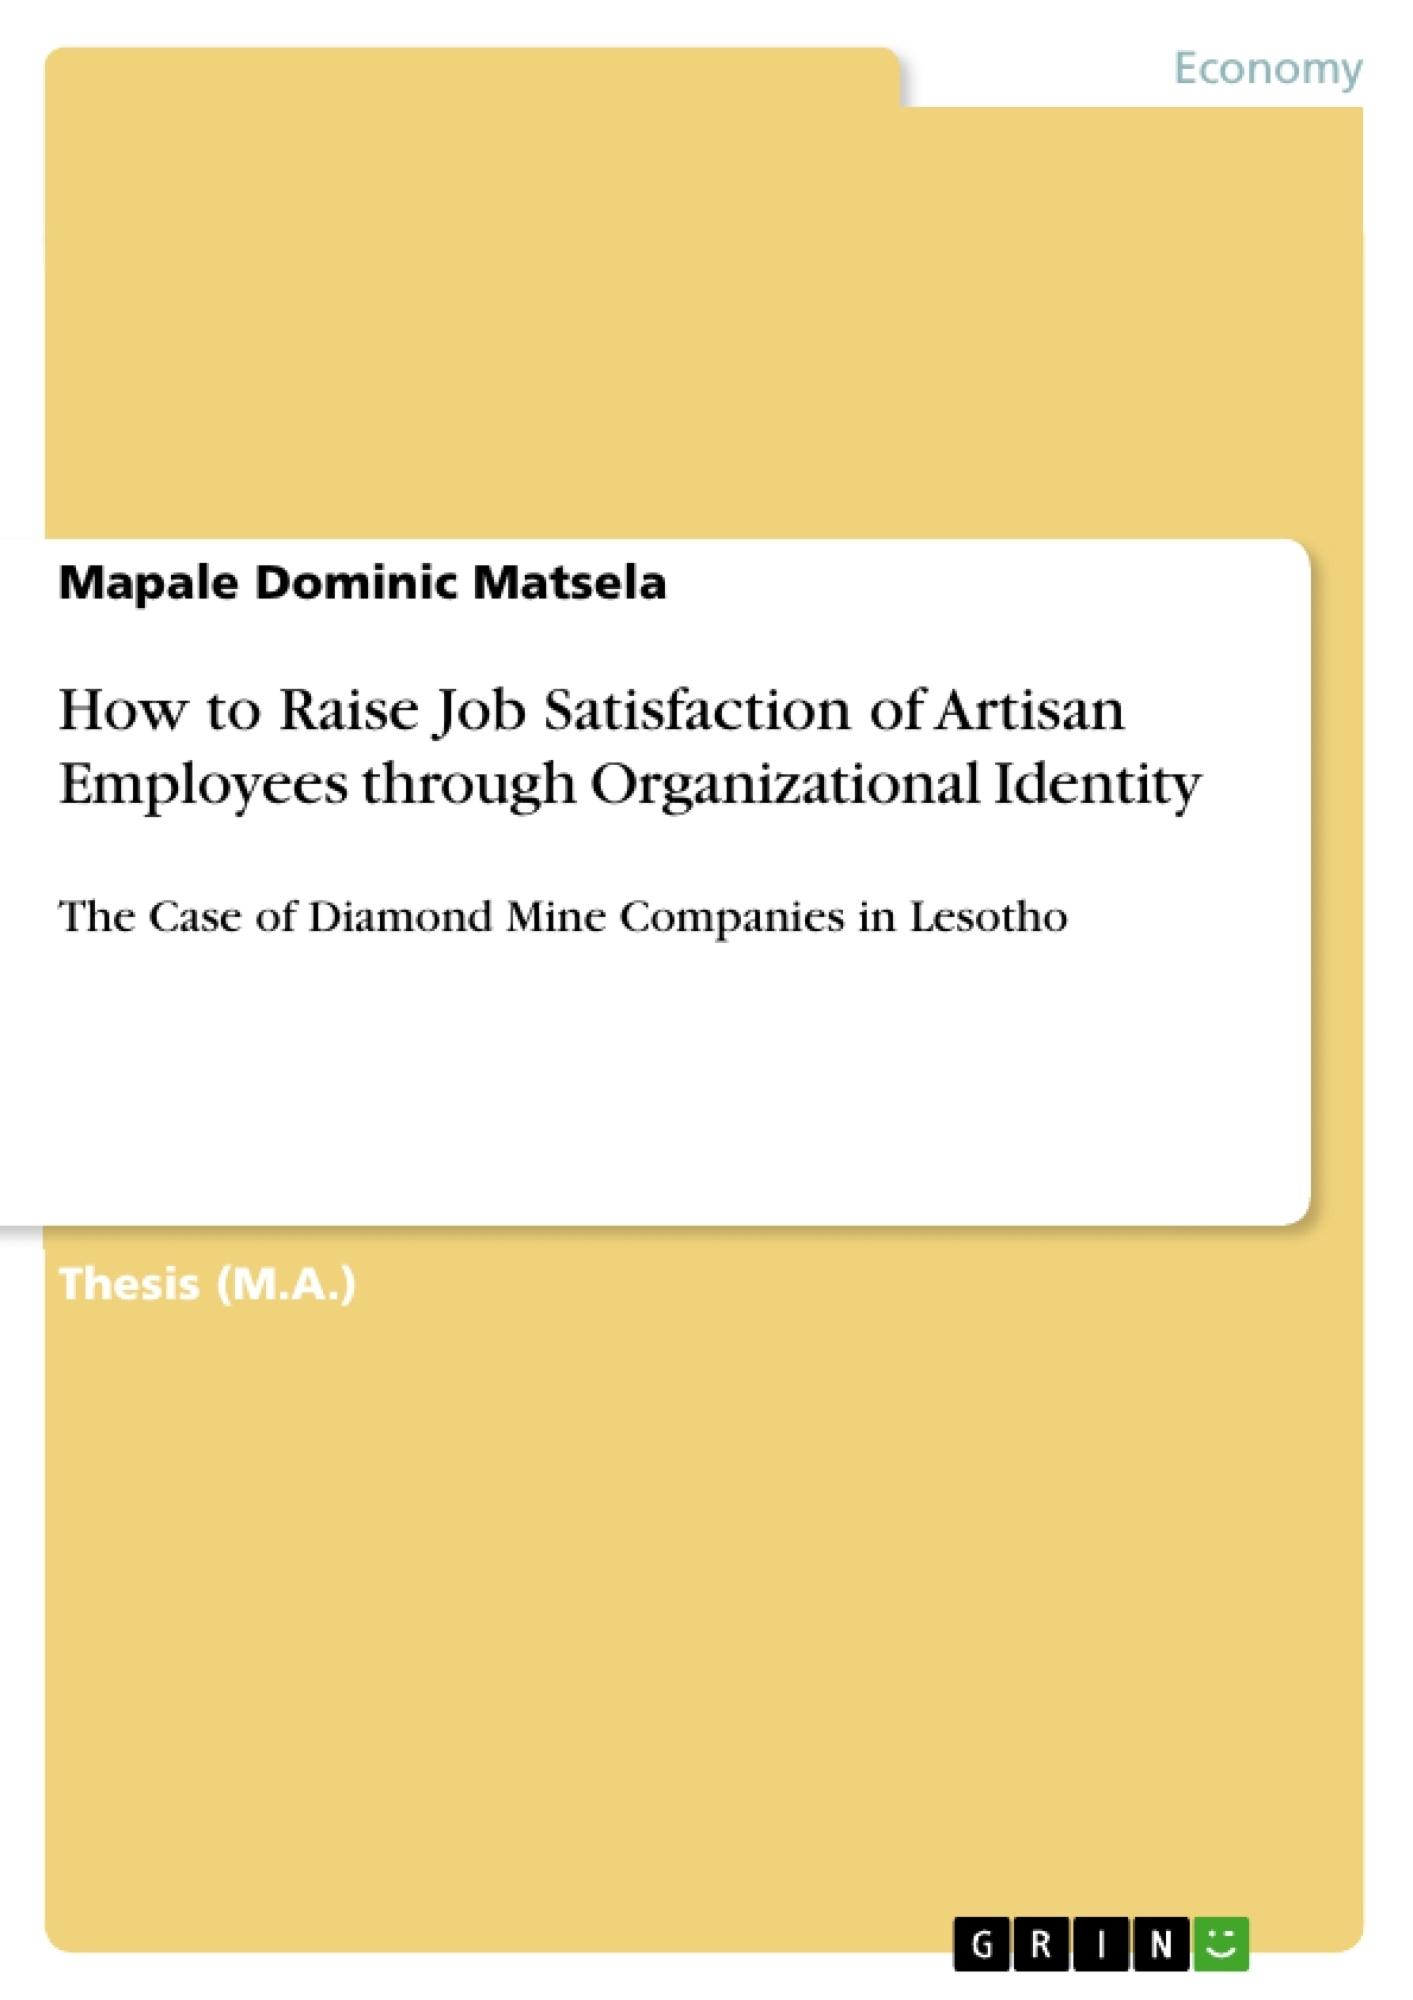 Title: How to Raise Job Satisfaction of Artisan Employees through Organizational Identity